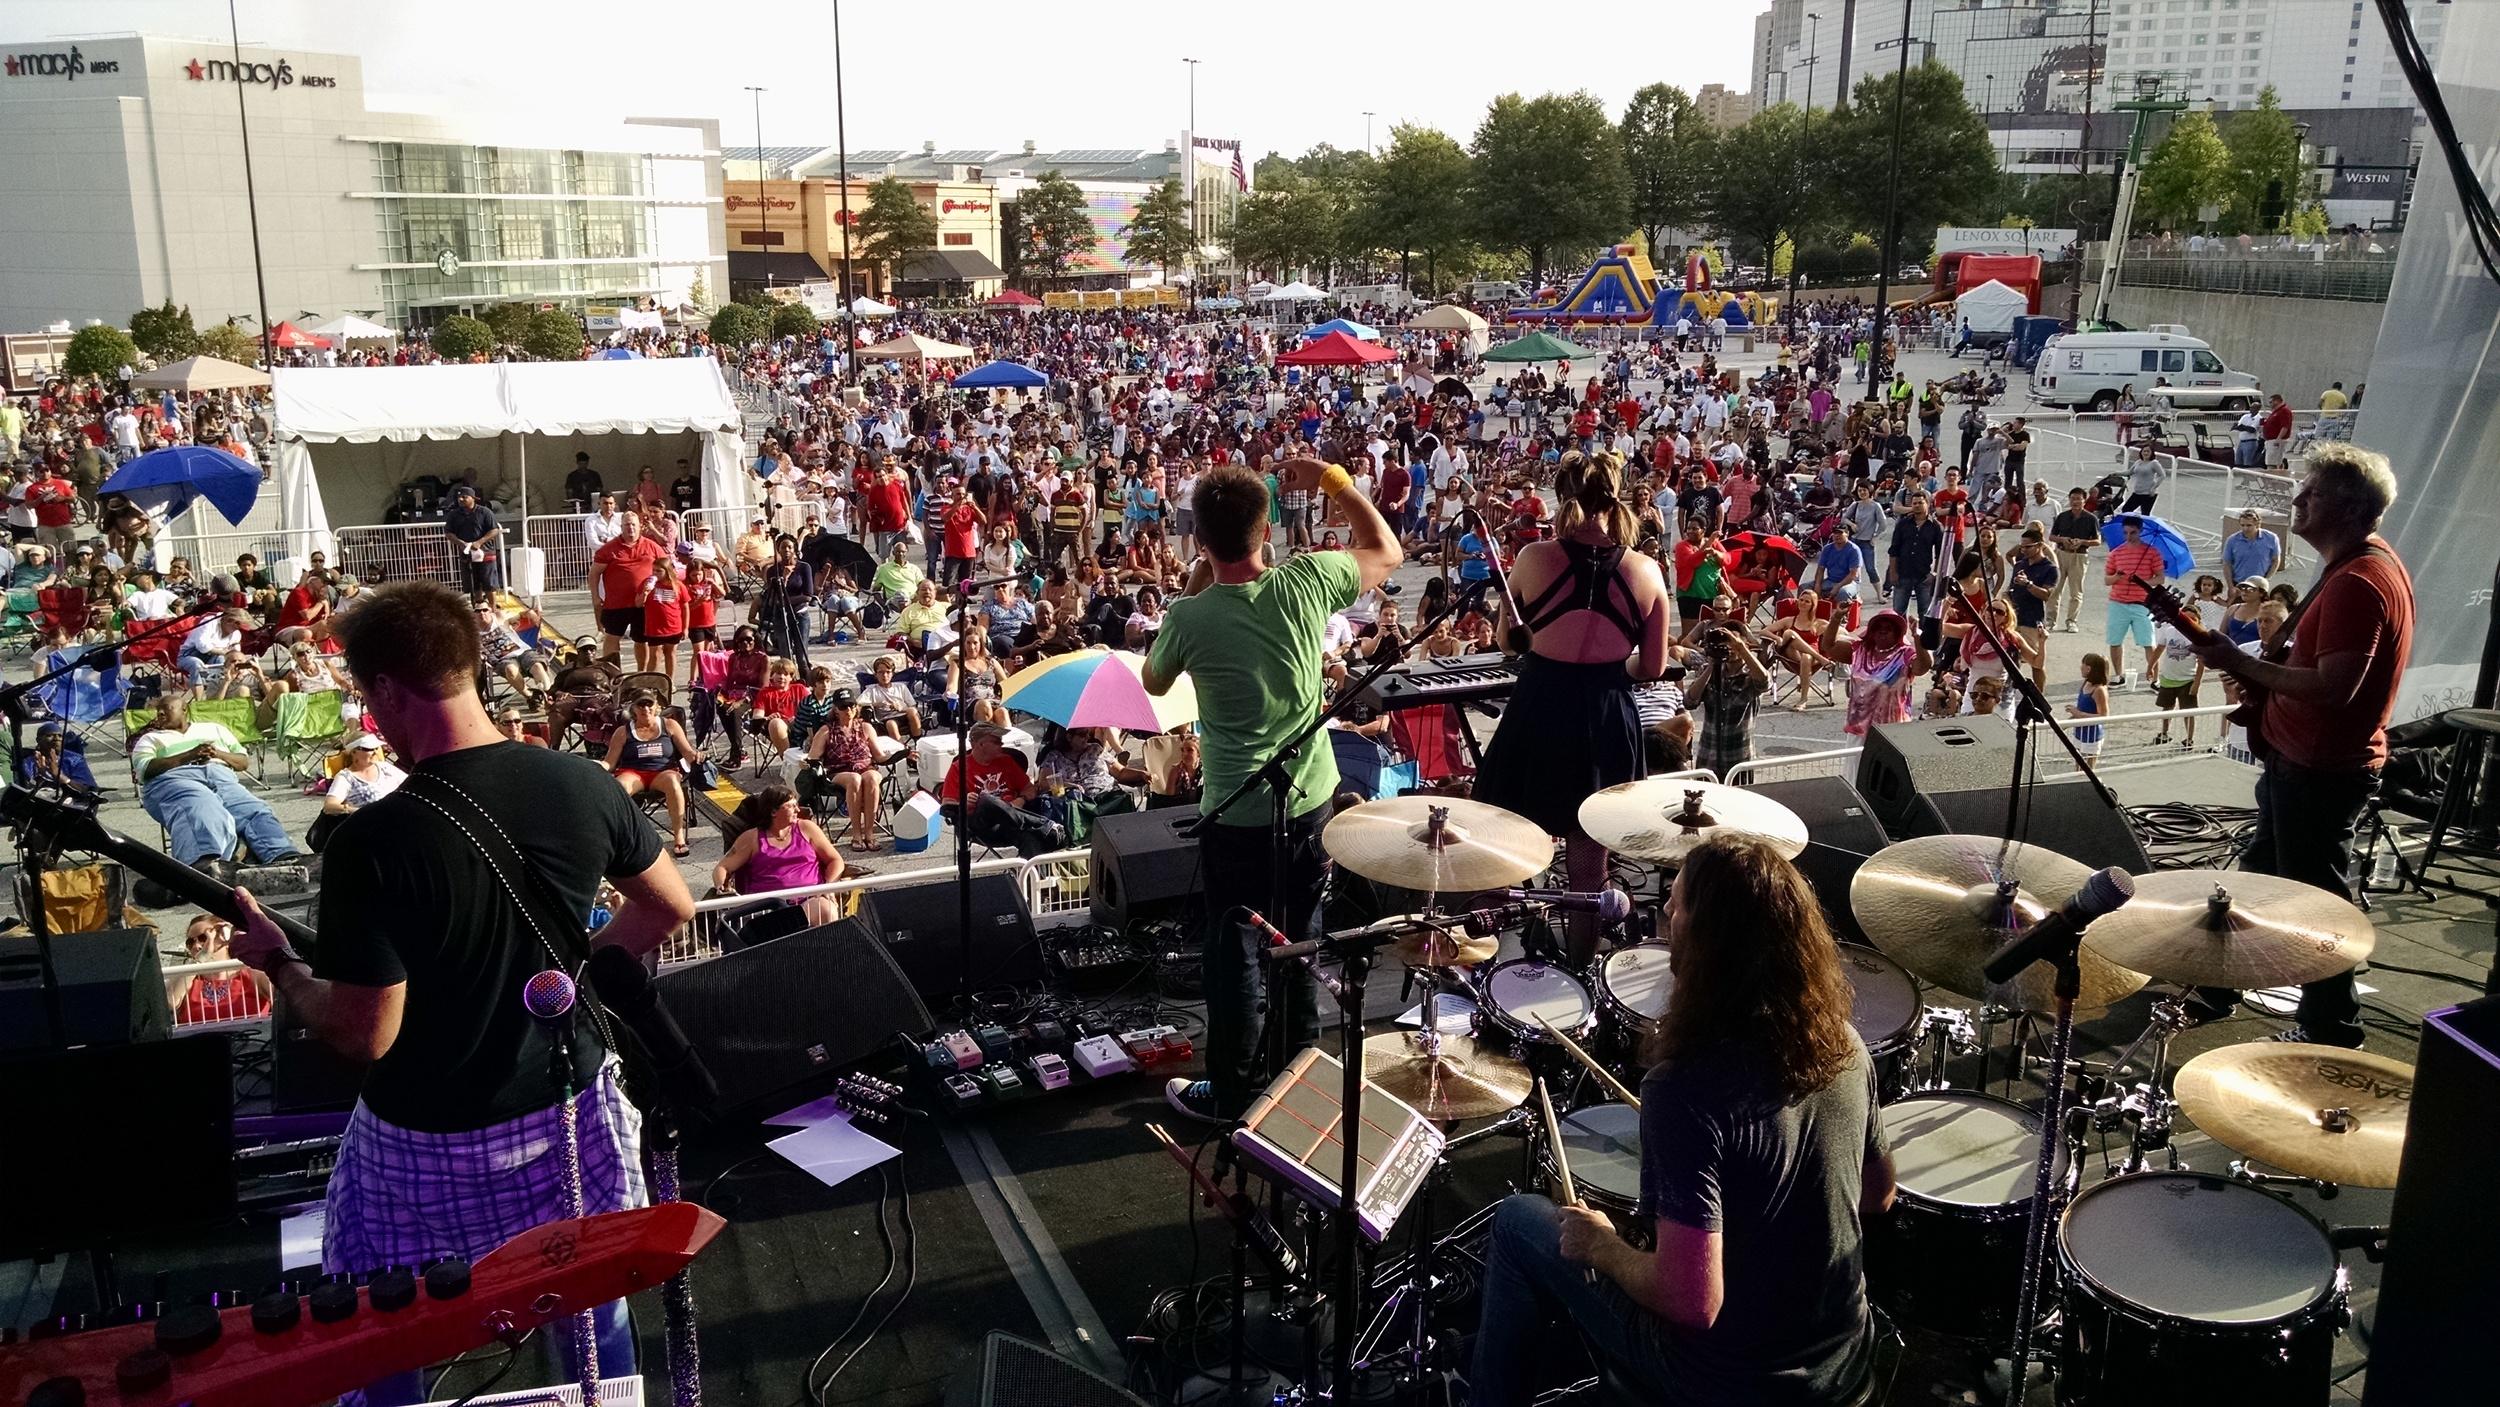 Gump Fiction - Legendary 4th of July at Lenox Square / Atlanta, Ga.